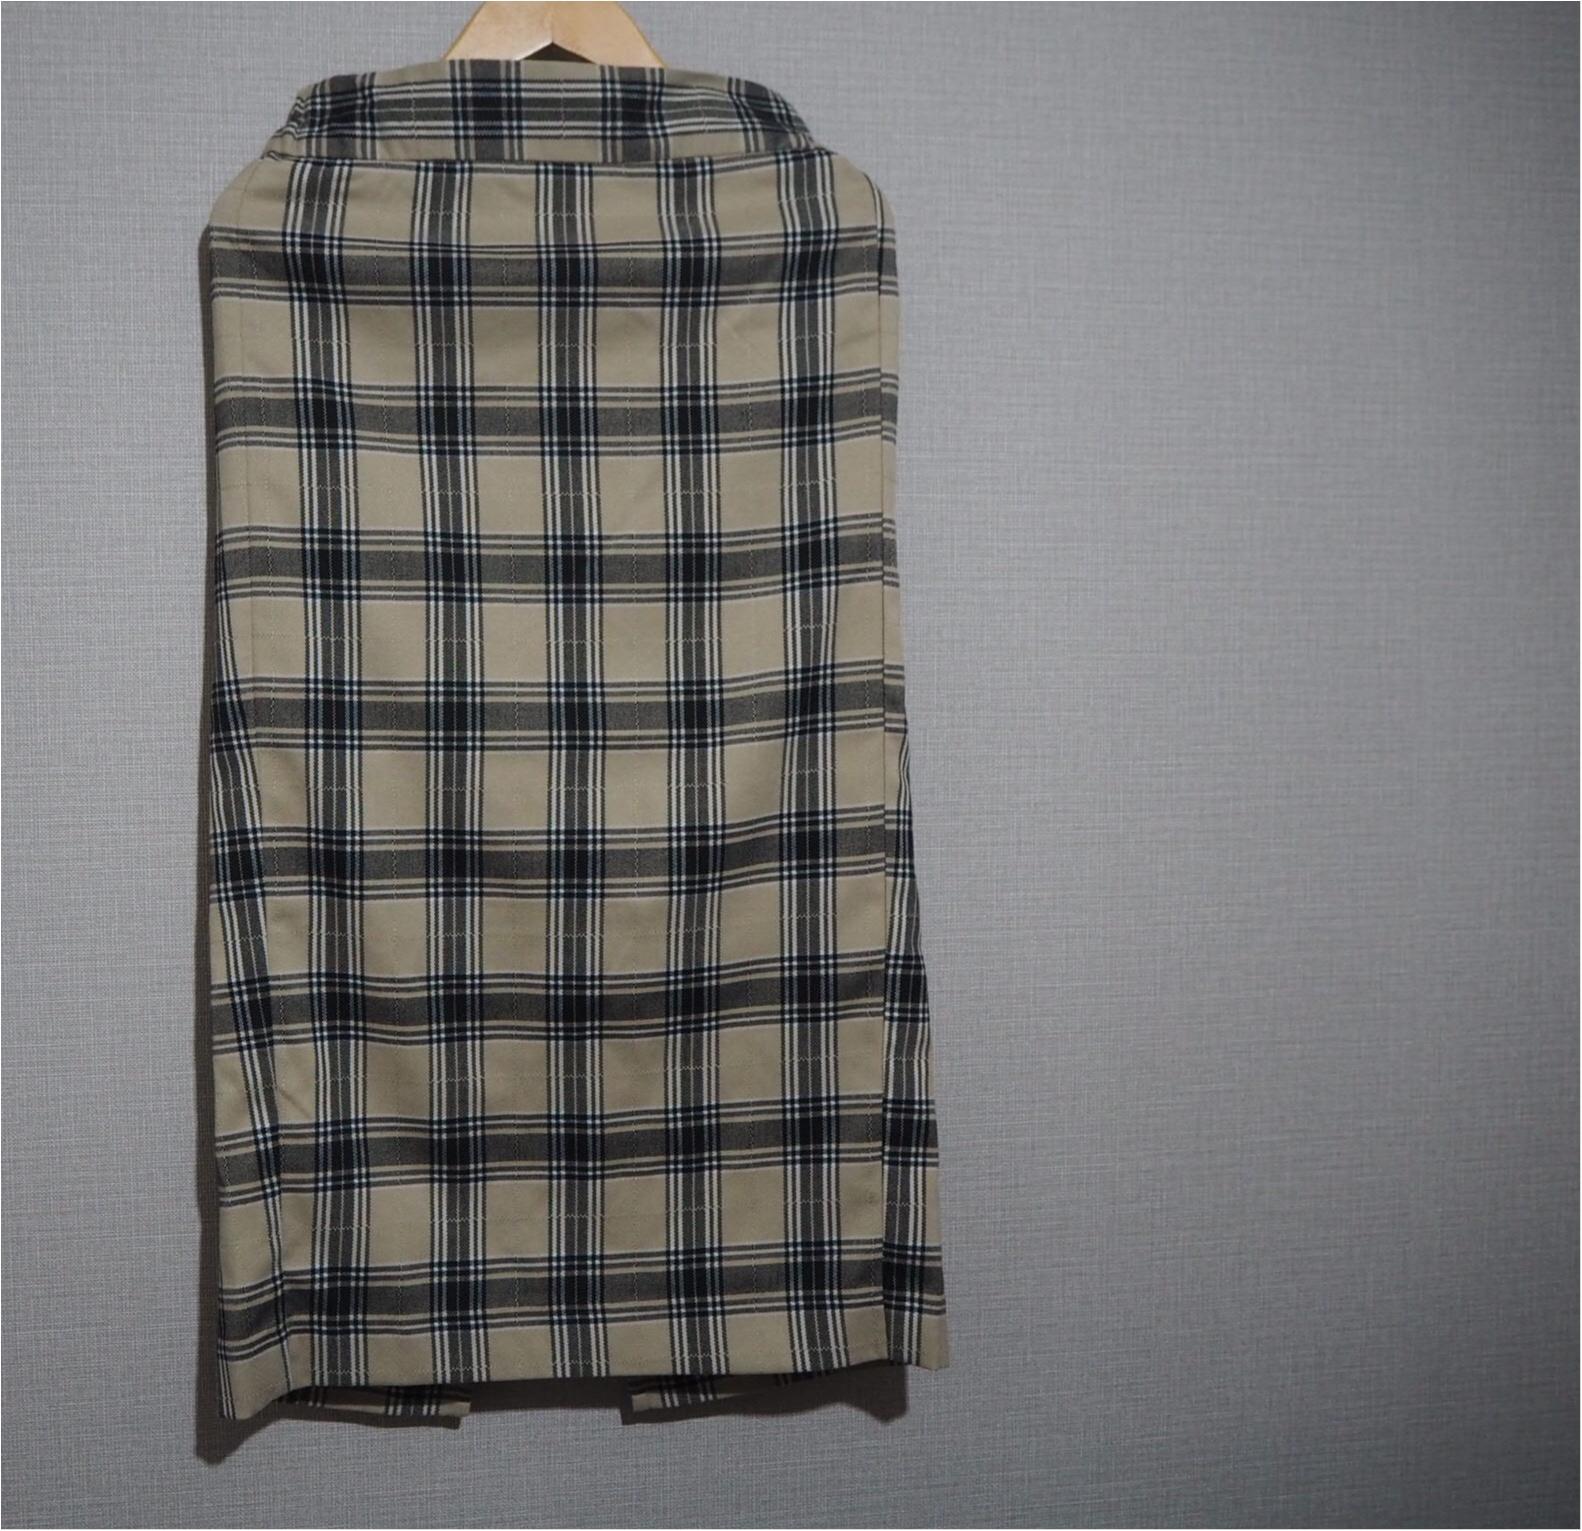 【GU購入品】チェックのタイトスカートで大人可愛く❤︎カジュアルにもレディにもまとめられて着まわし抜群優秀です☝︎_1